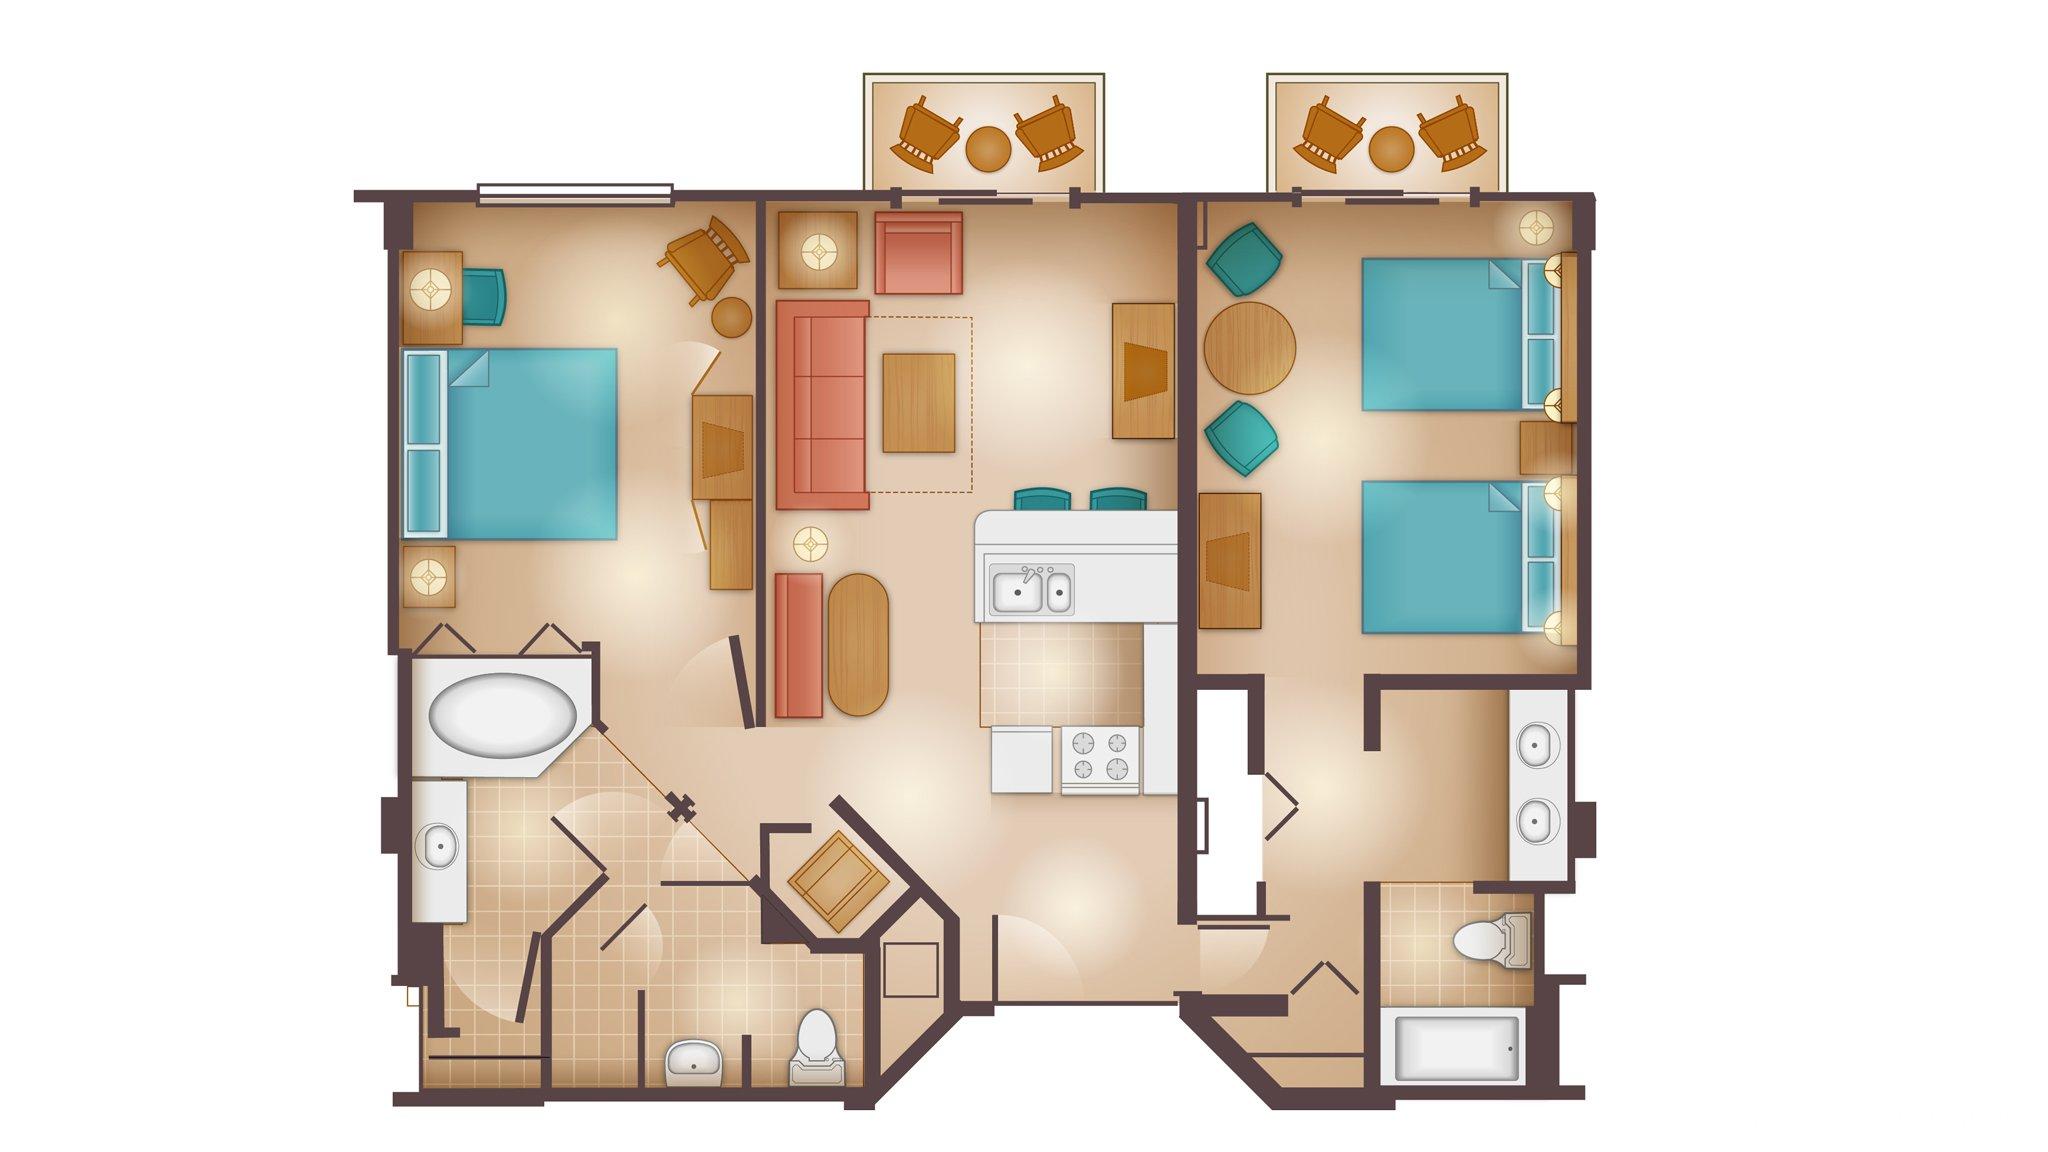 Floorplans For 2 Bedroom Villa At Disney S Beach Club Resort The Dis Disney Discussion Forums Disboards Com